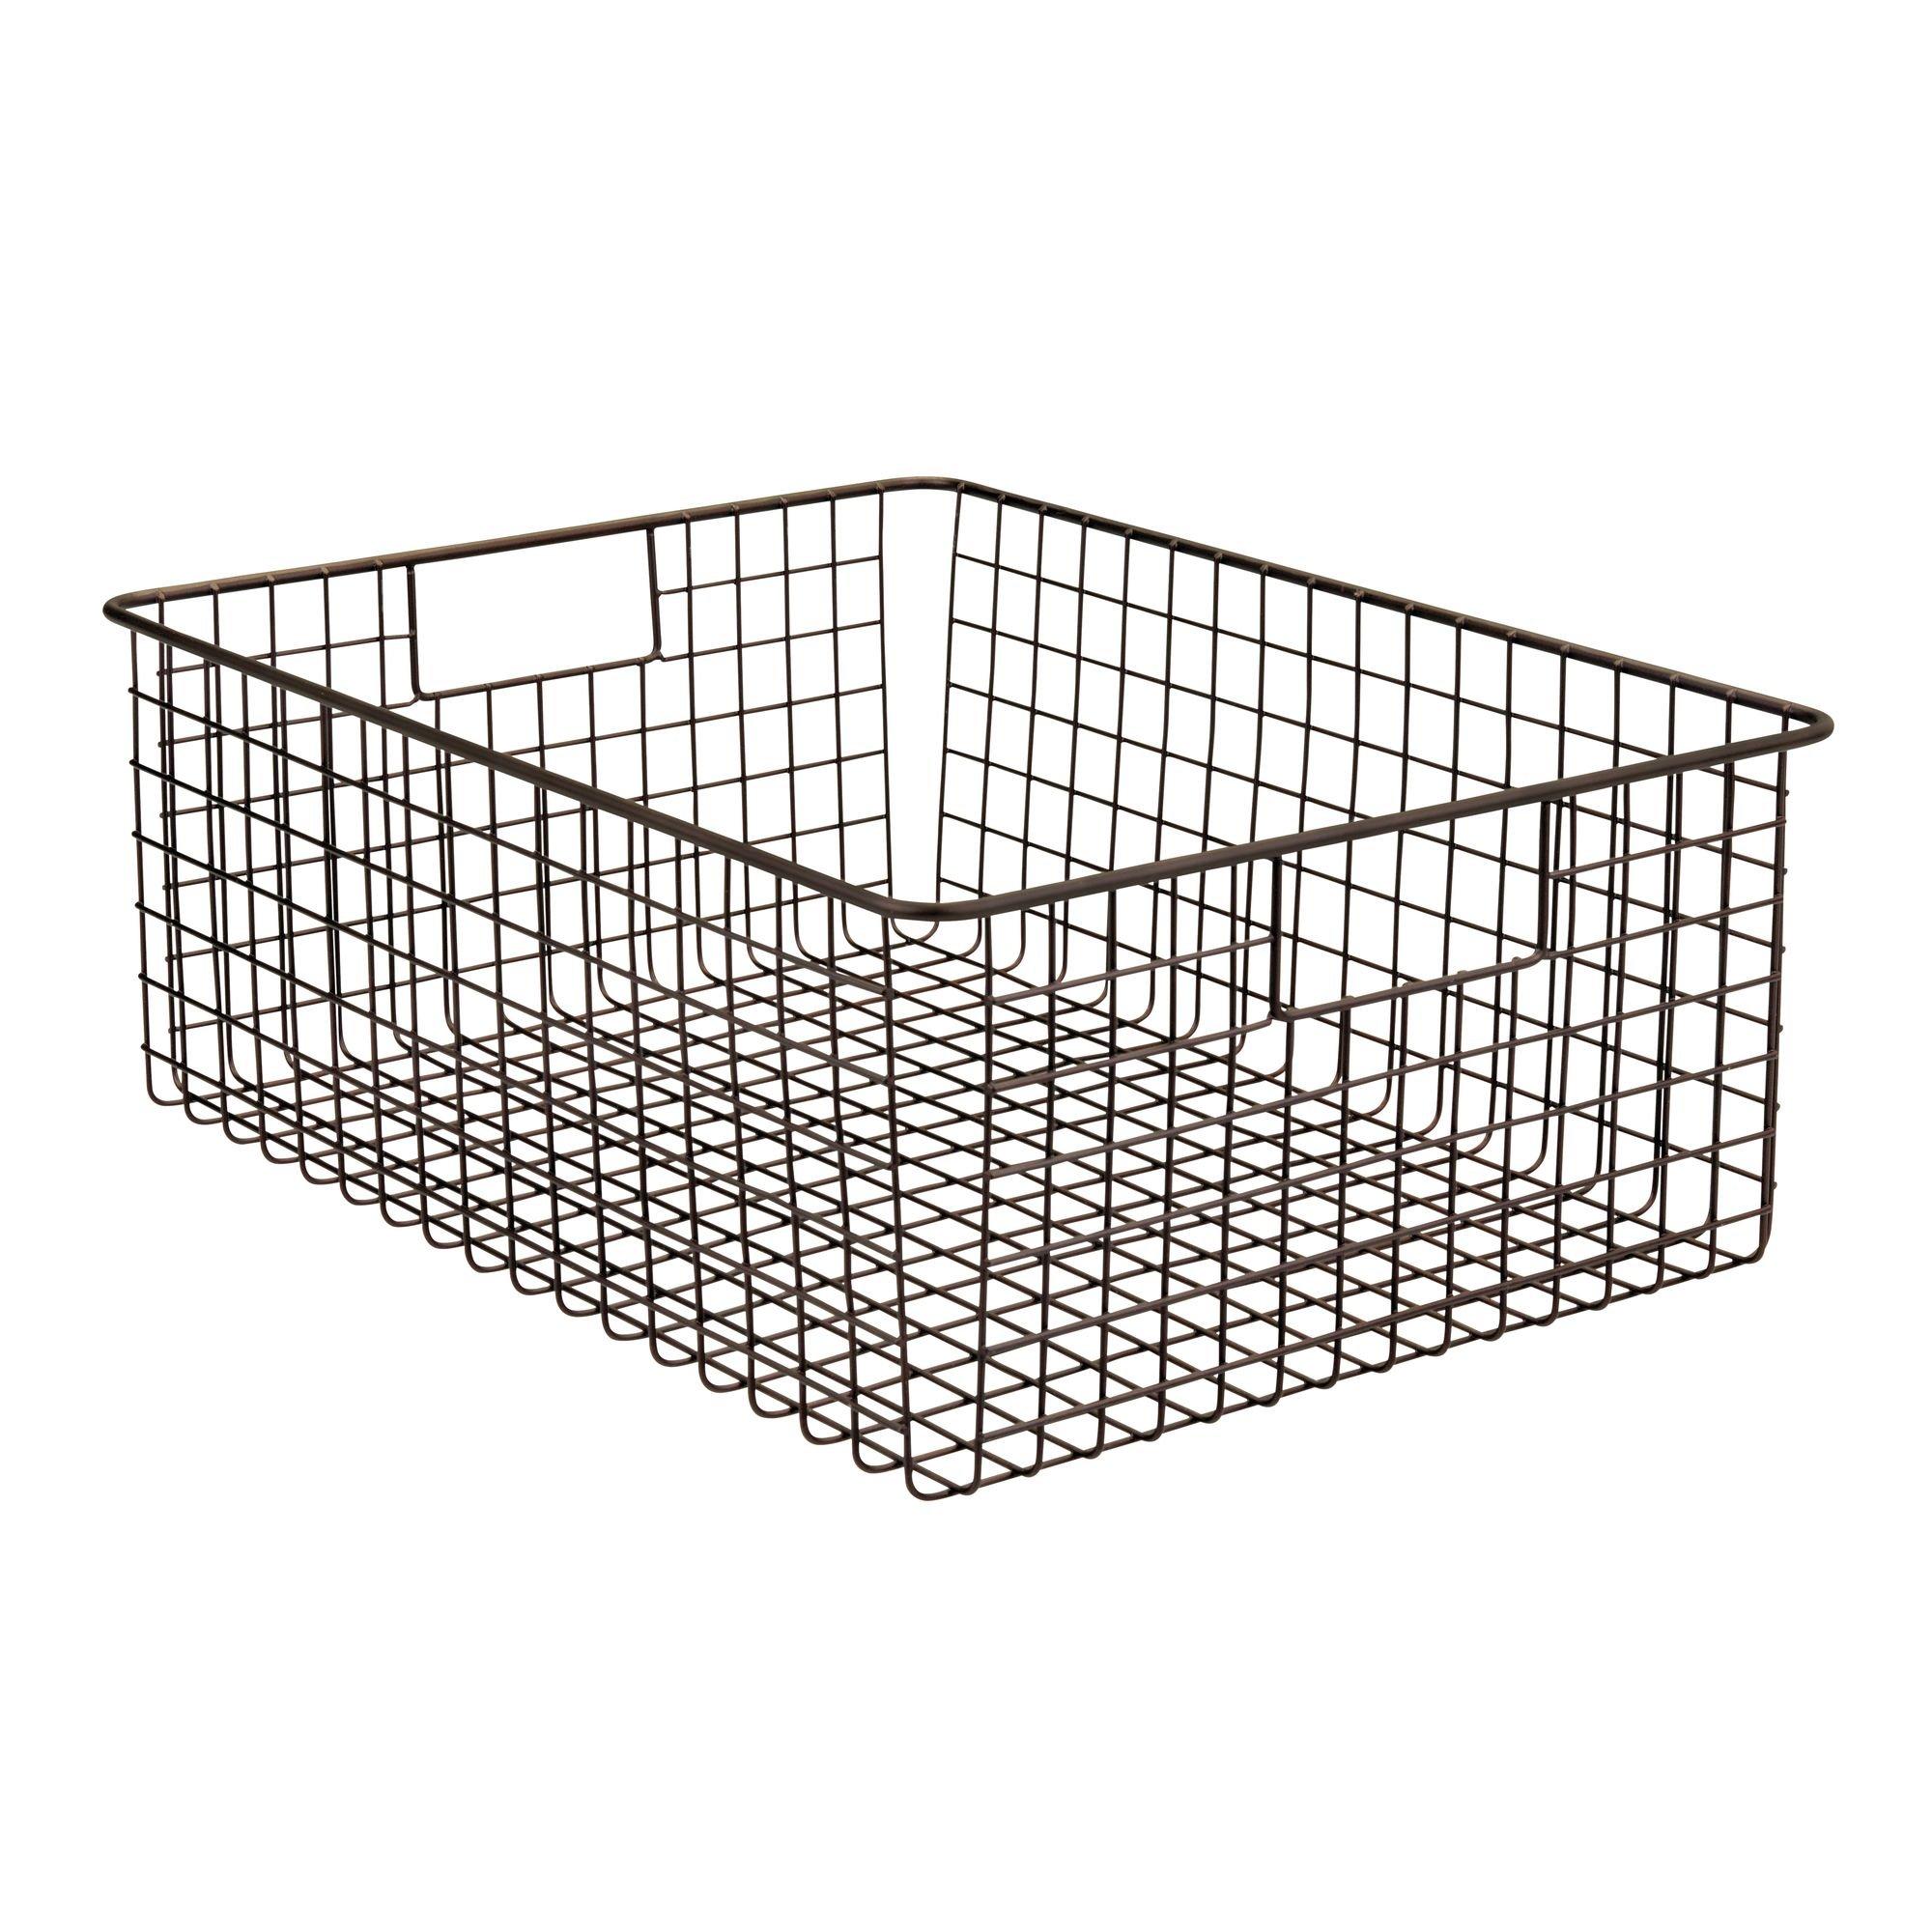 Organizador de cosm/éticos para el ba/ño gris oscuro Cesto de alambre ancho con atractivo dise/ño de rejilla mDesign Juego de 4 cestas de metal con asas integradas